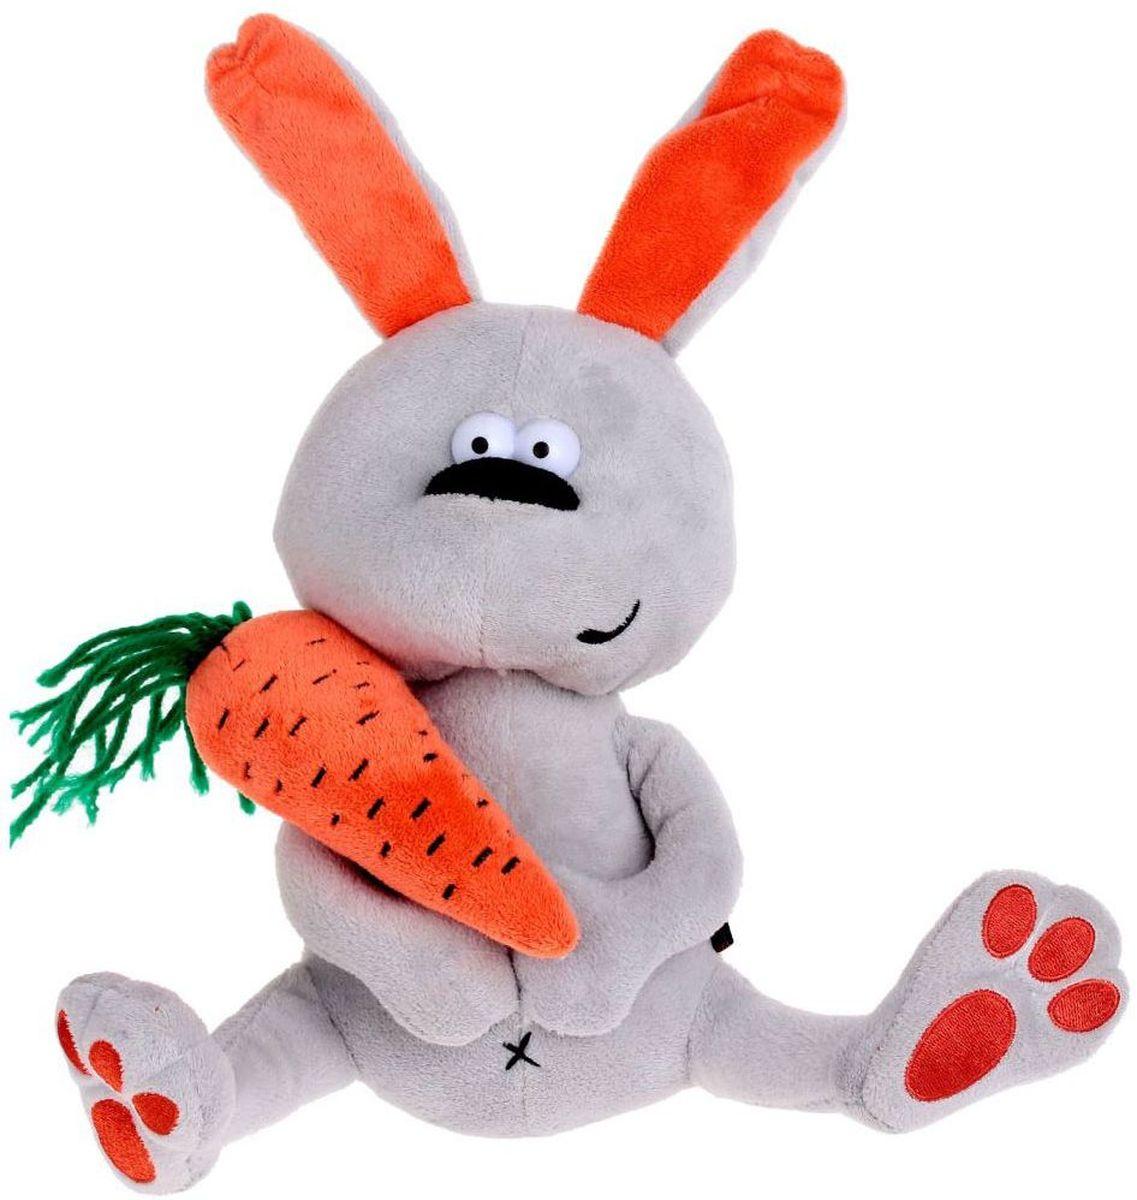 MaxiToys Мягкая игрушка Заяц & Morkovka 22 см kaloo мягкая игрушка заяц белочка 15 см